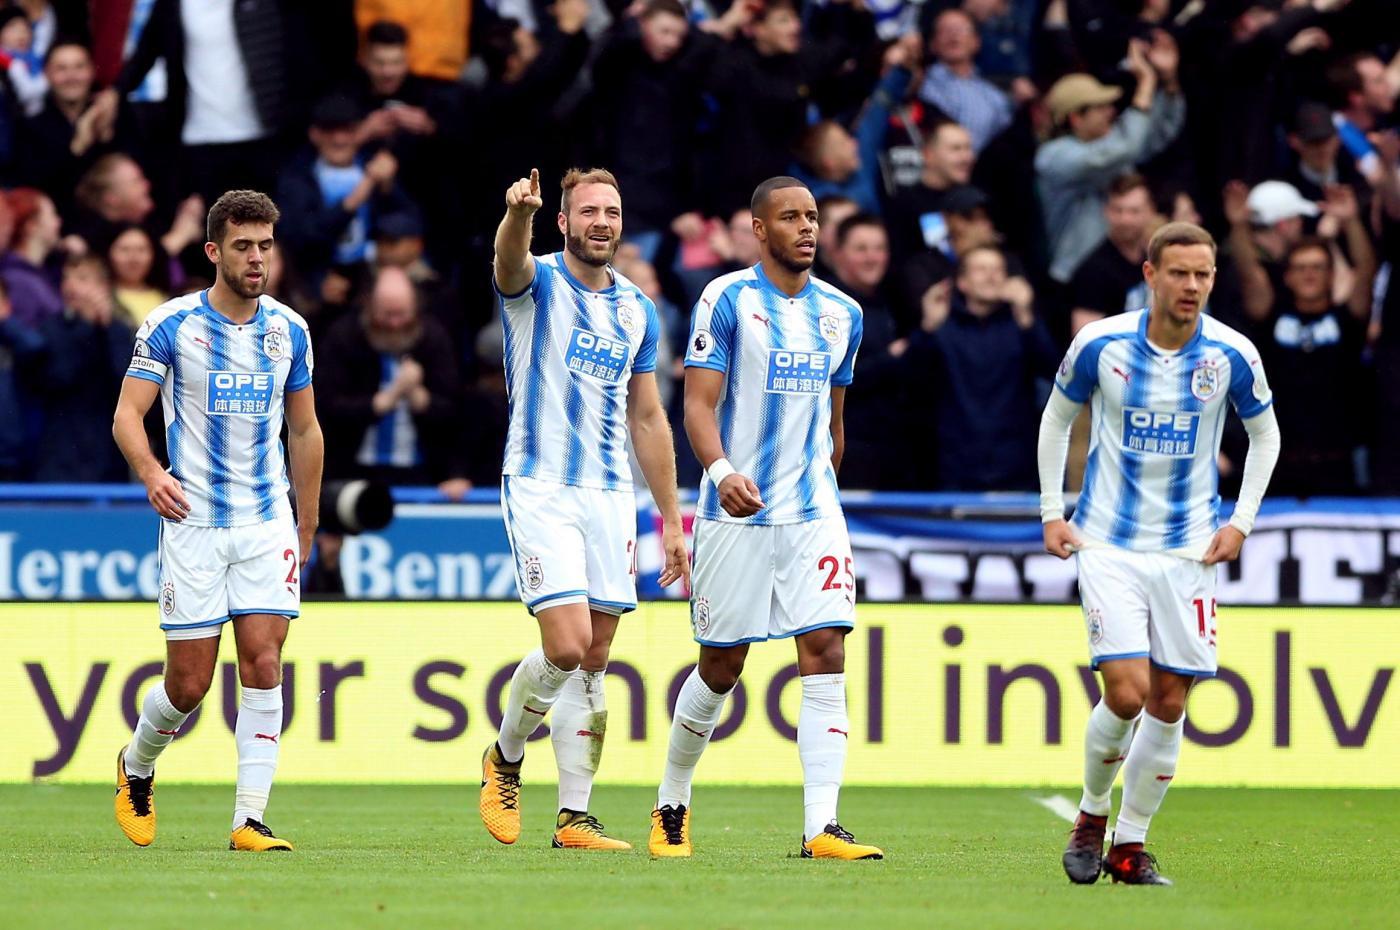 Bristol City-Huddersfield sabato 5 gennaio